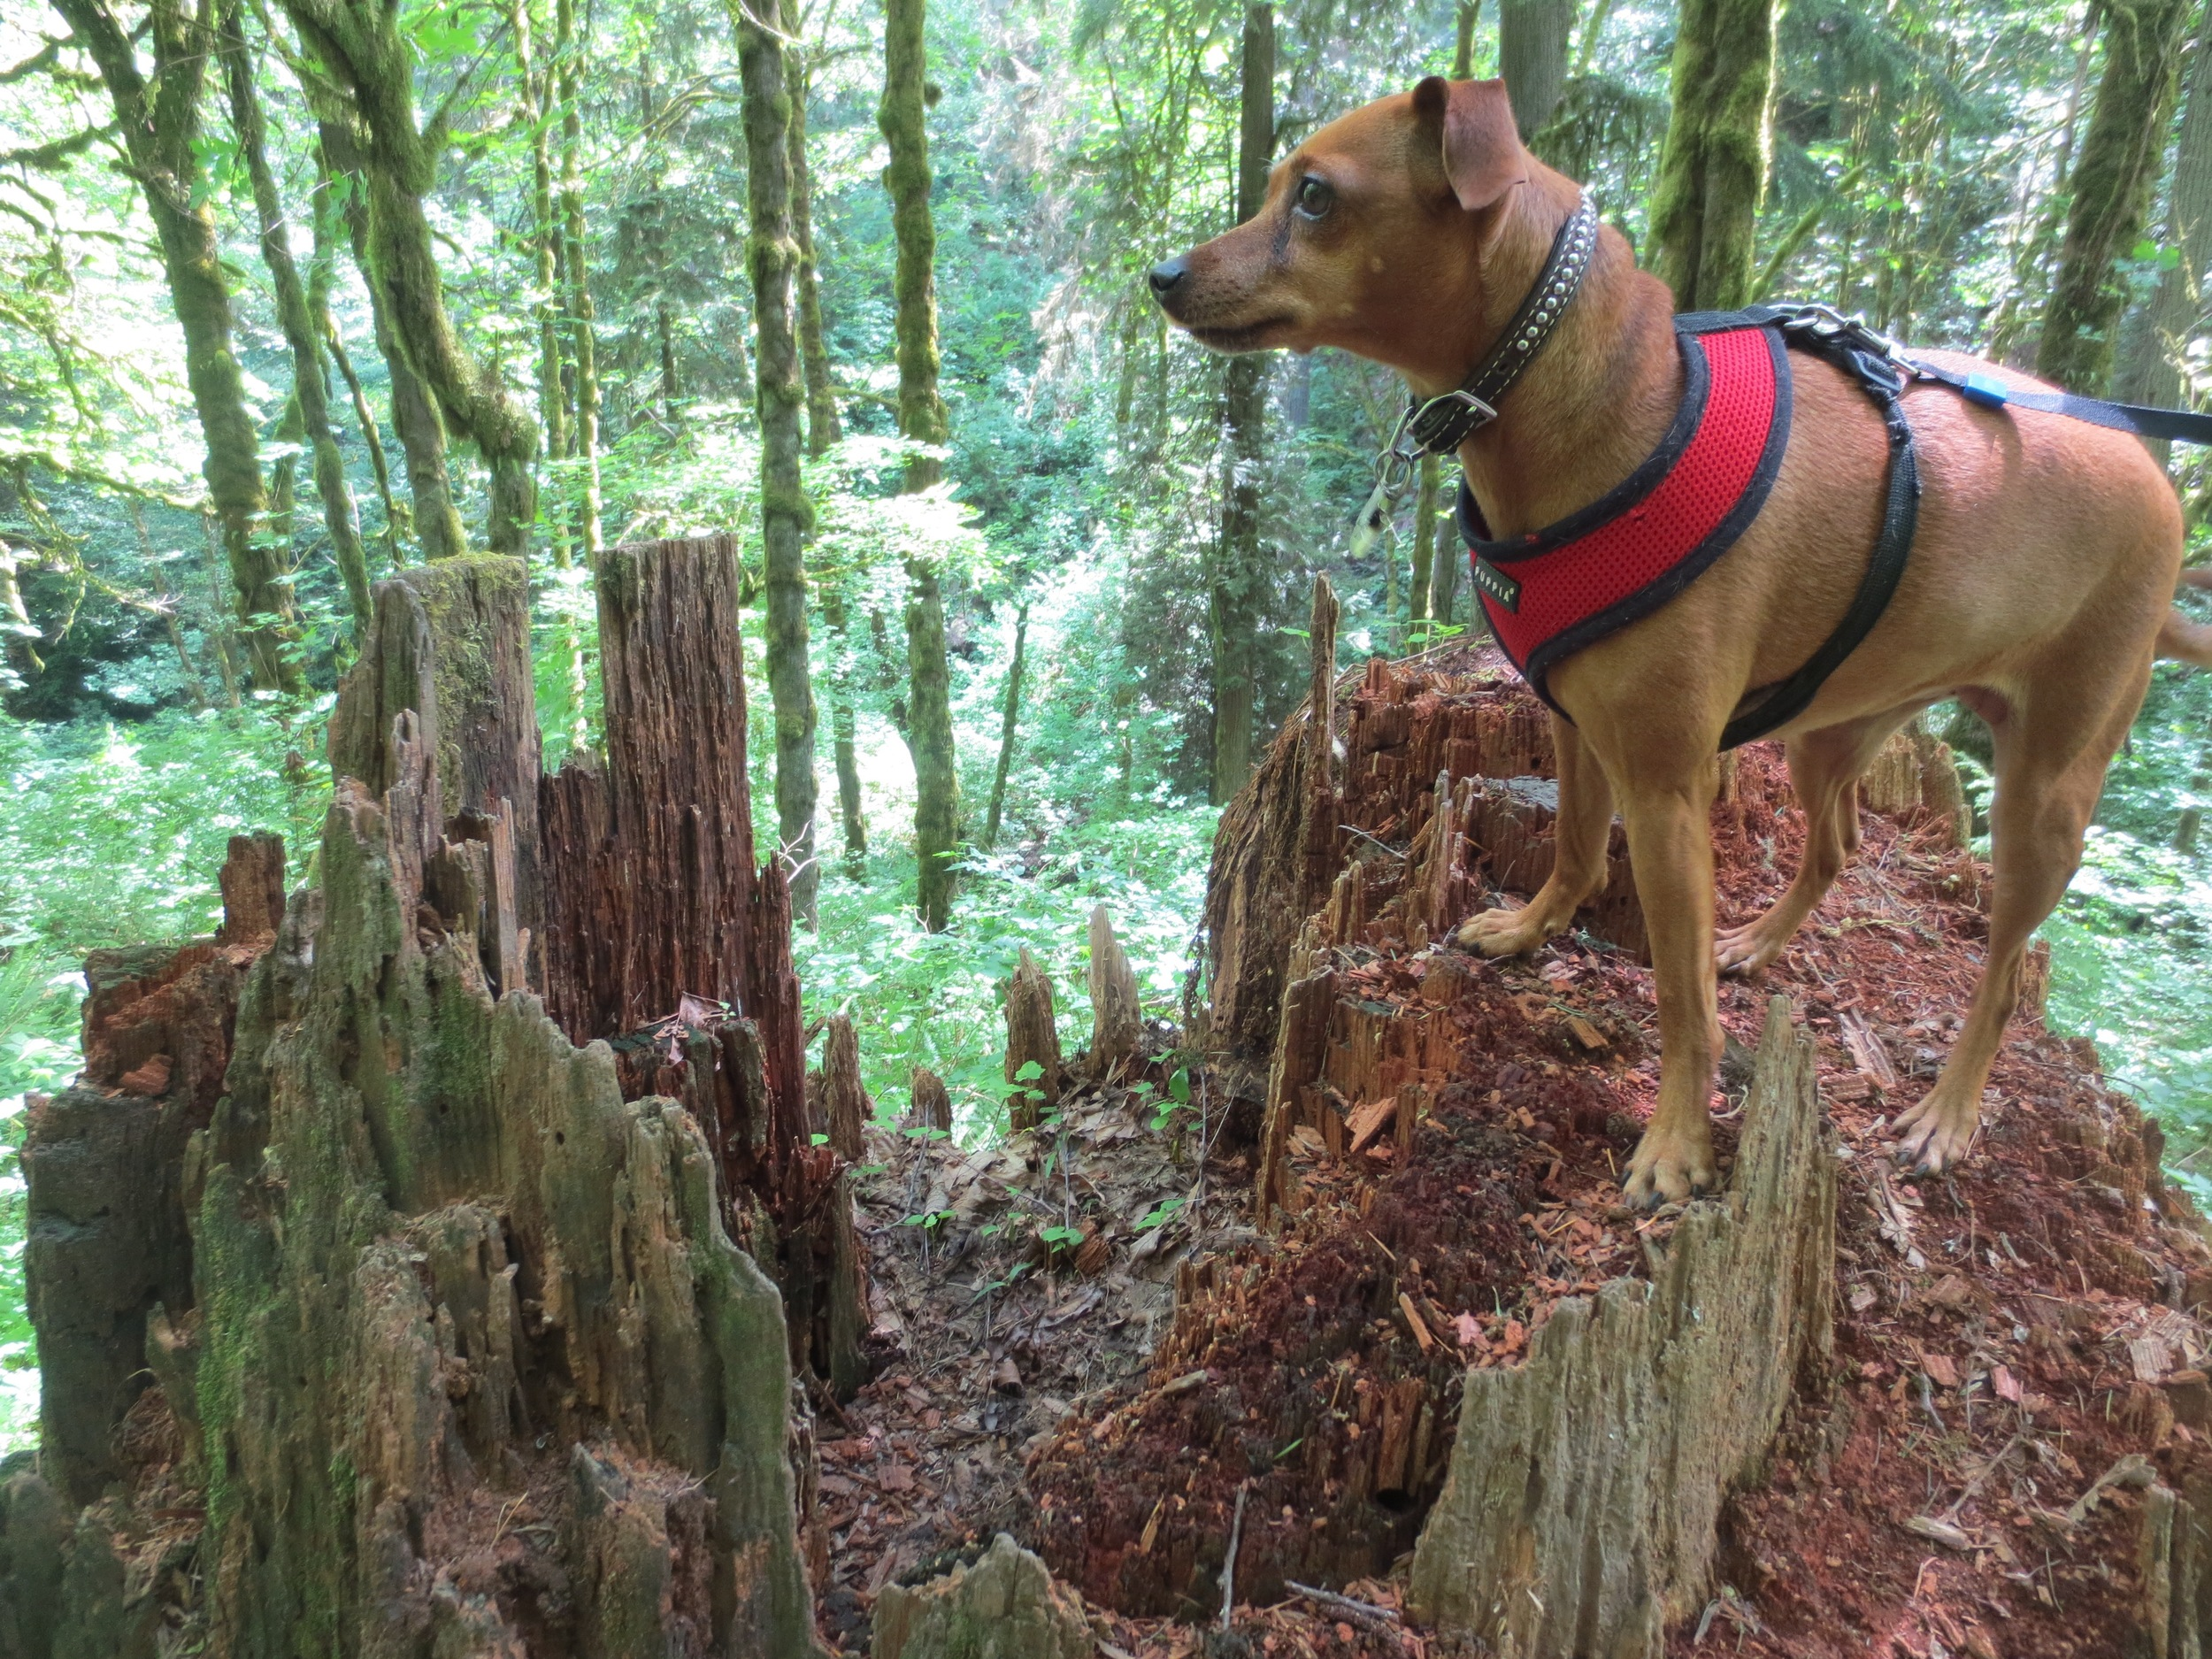 Nature dog.